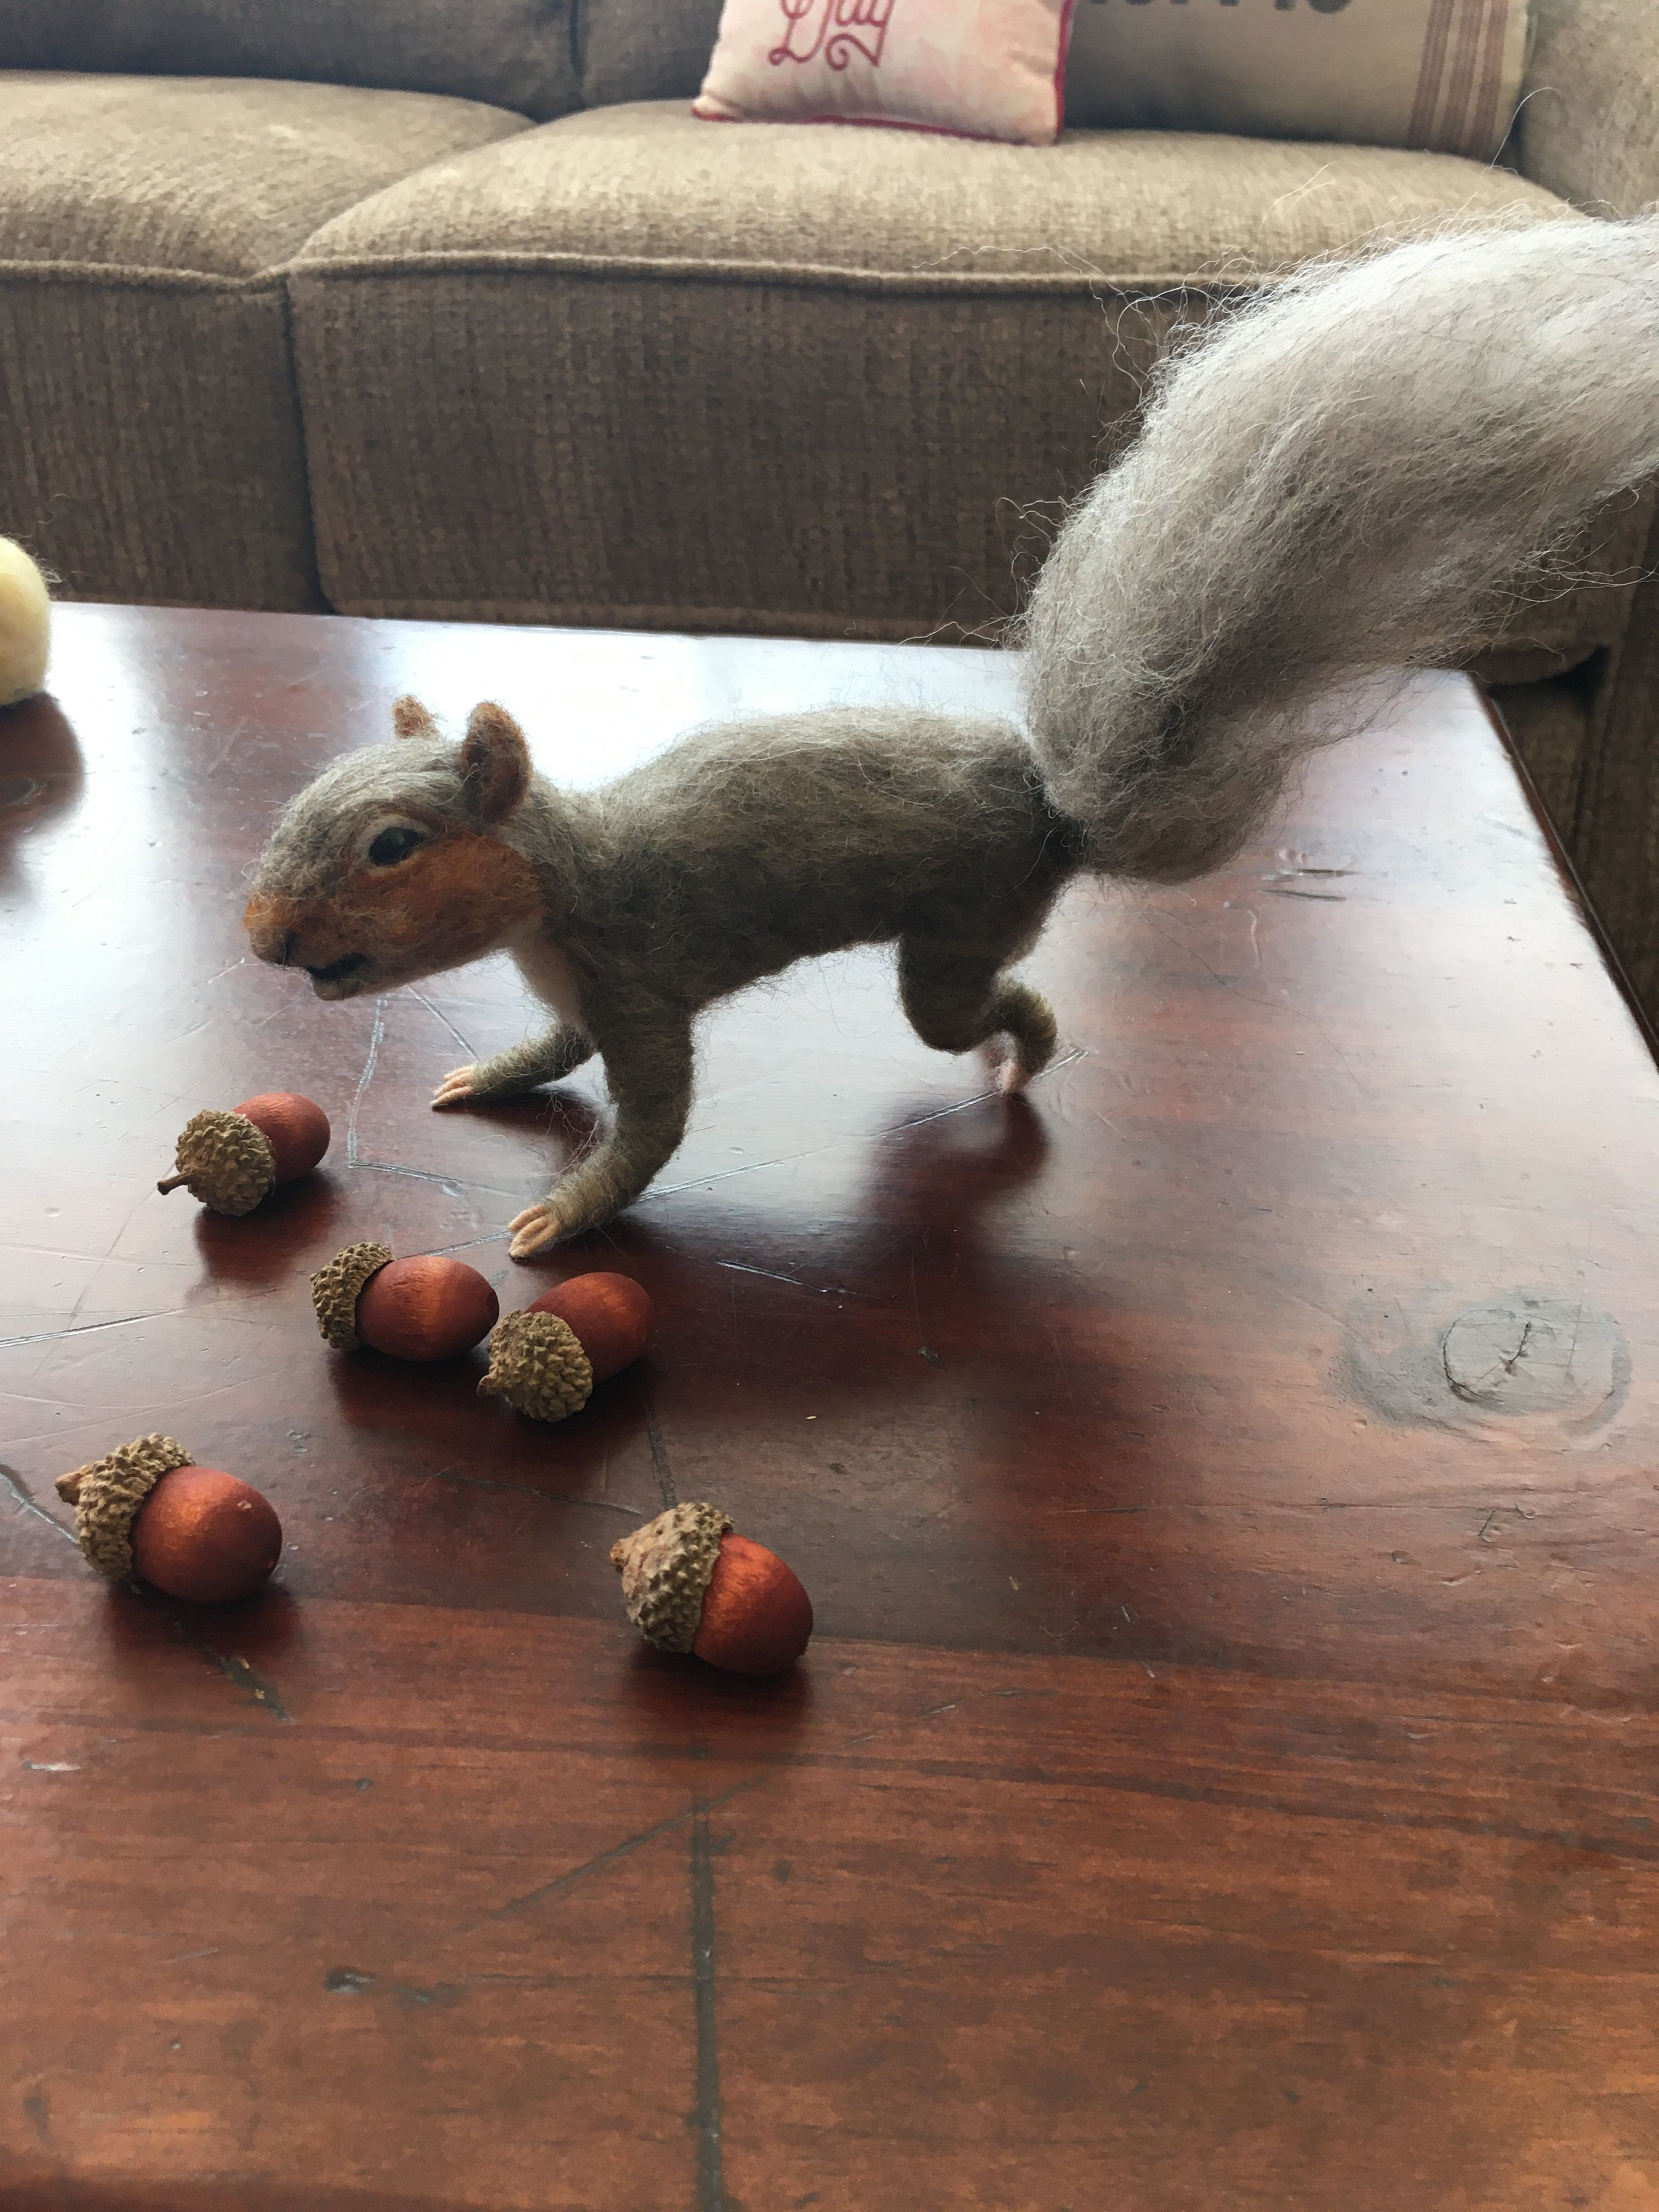 Needle Felt Squirrel Baby Squirrel Felt Baby Needle Felting [ 4032 x 3024 Pixel ]